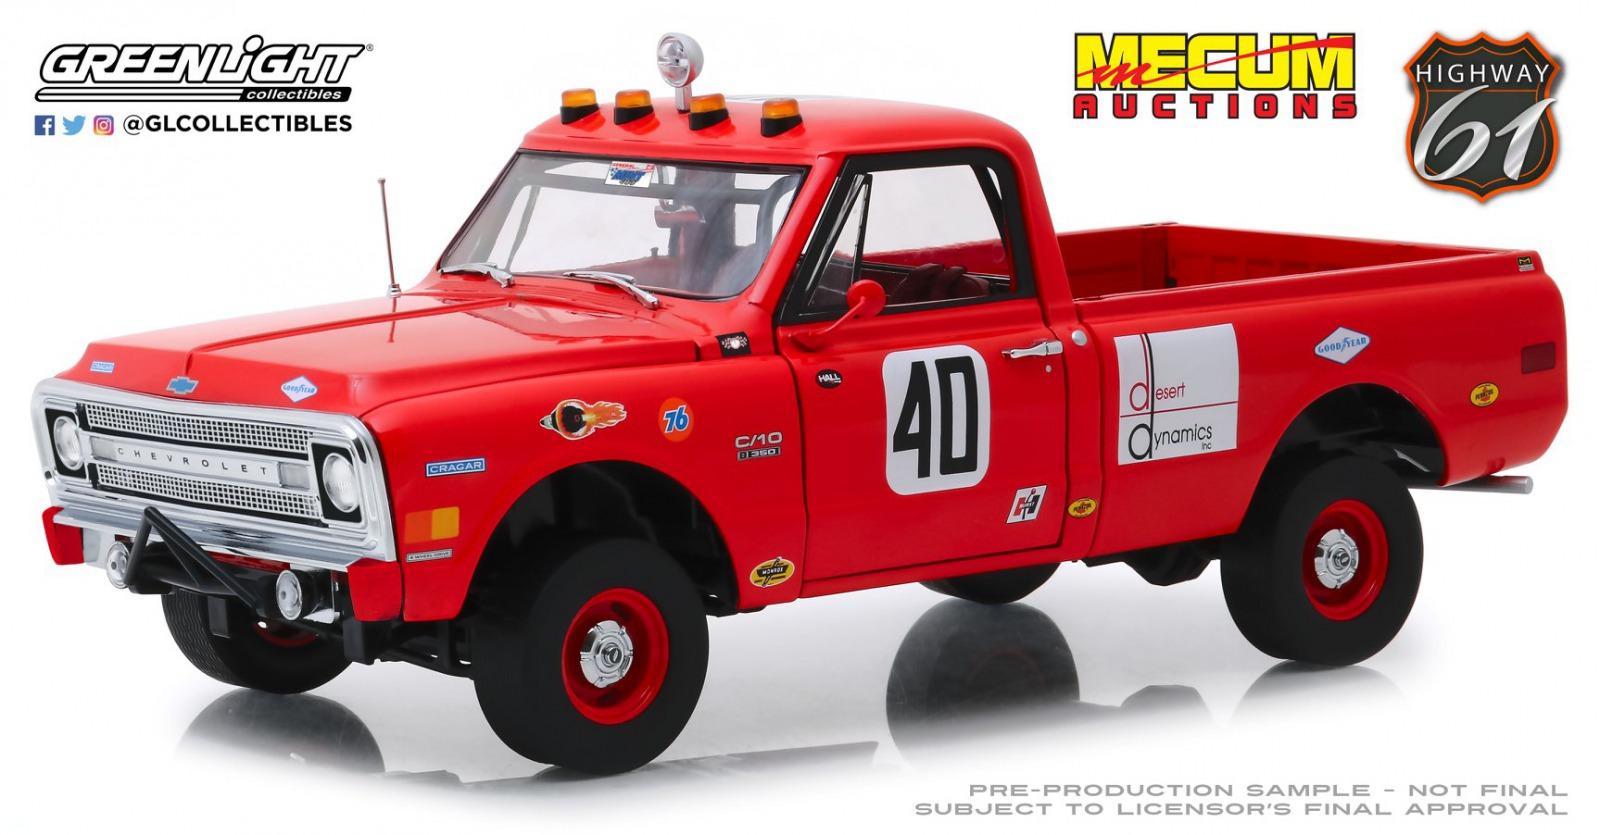 Highway 61 1/18 ミニカー ダイキャストモデル 1969年モデル Baja1000 シボレー C-101969 Chevrolet C-10 Baja 1000 Truck 1:18 red by Highway 61